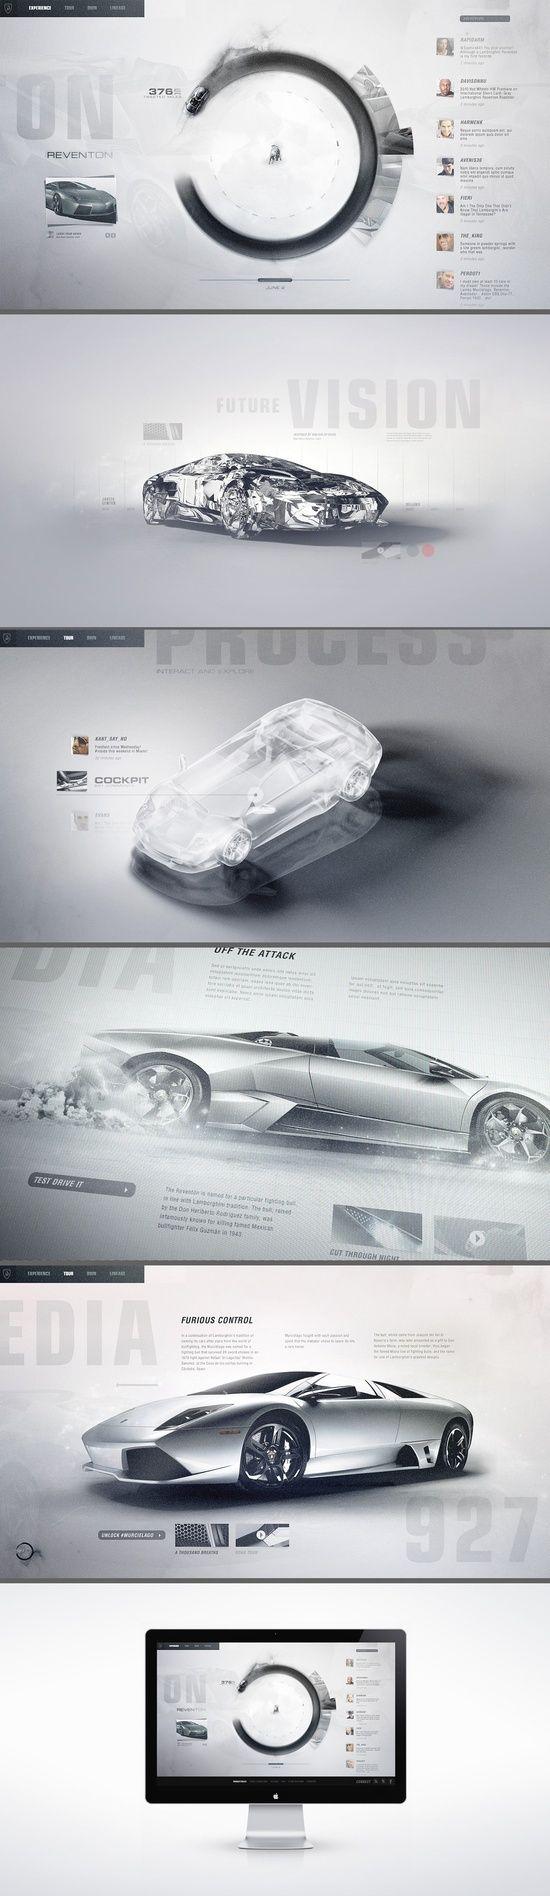 Sites / GI: Lamborghini Lineage / Interactive Concept Design for Automobili Lamborghini. A gestural touch screen interface invites enthusiasts to ex